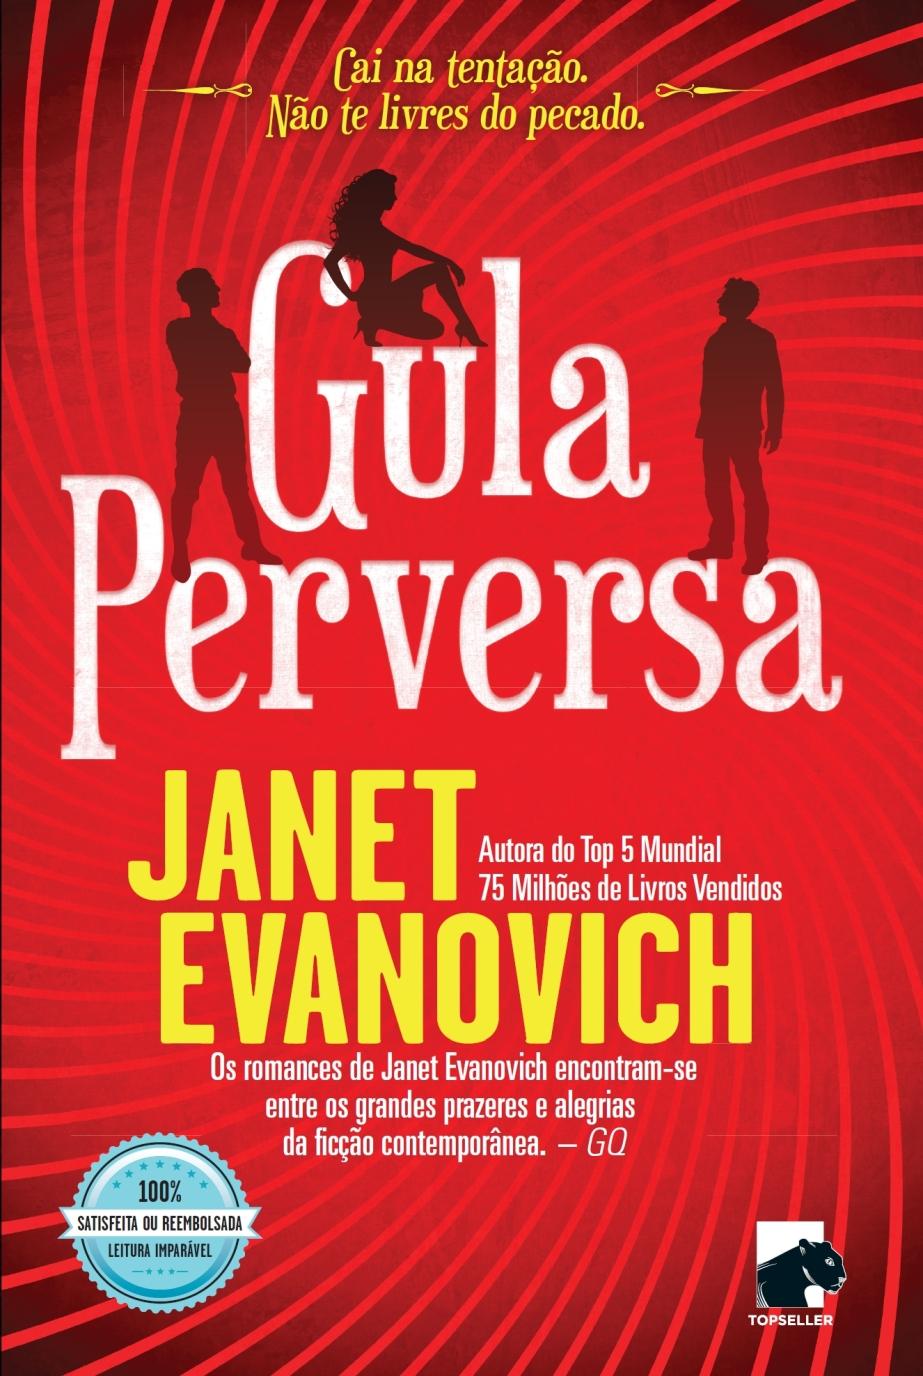 http://efeitodoslivros.blogspot.pt/2013/05/gula-perversa-opiniao.html